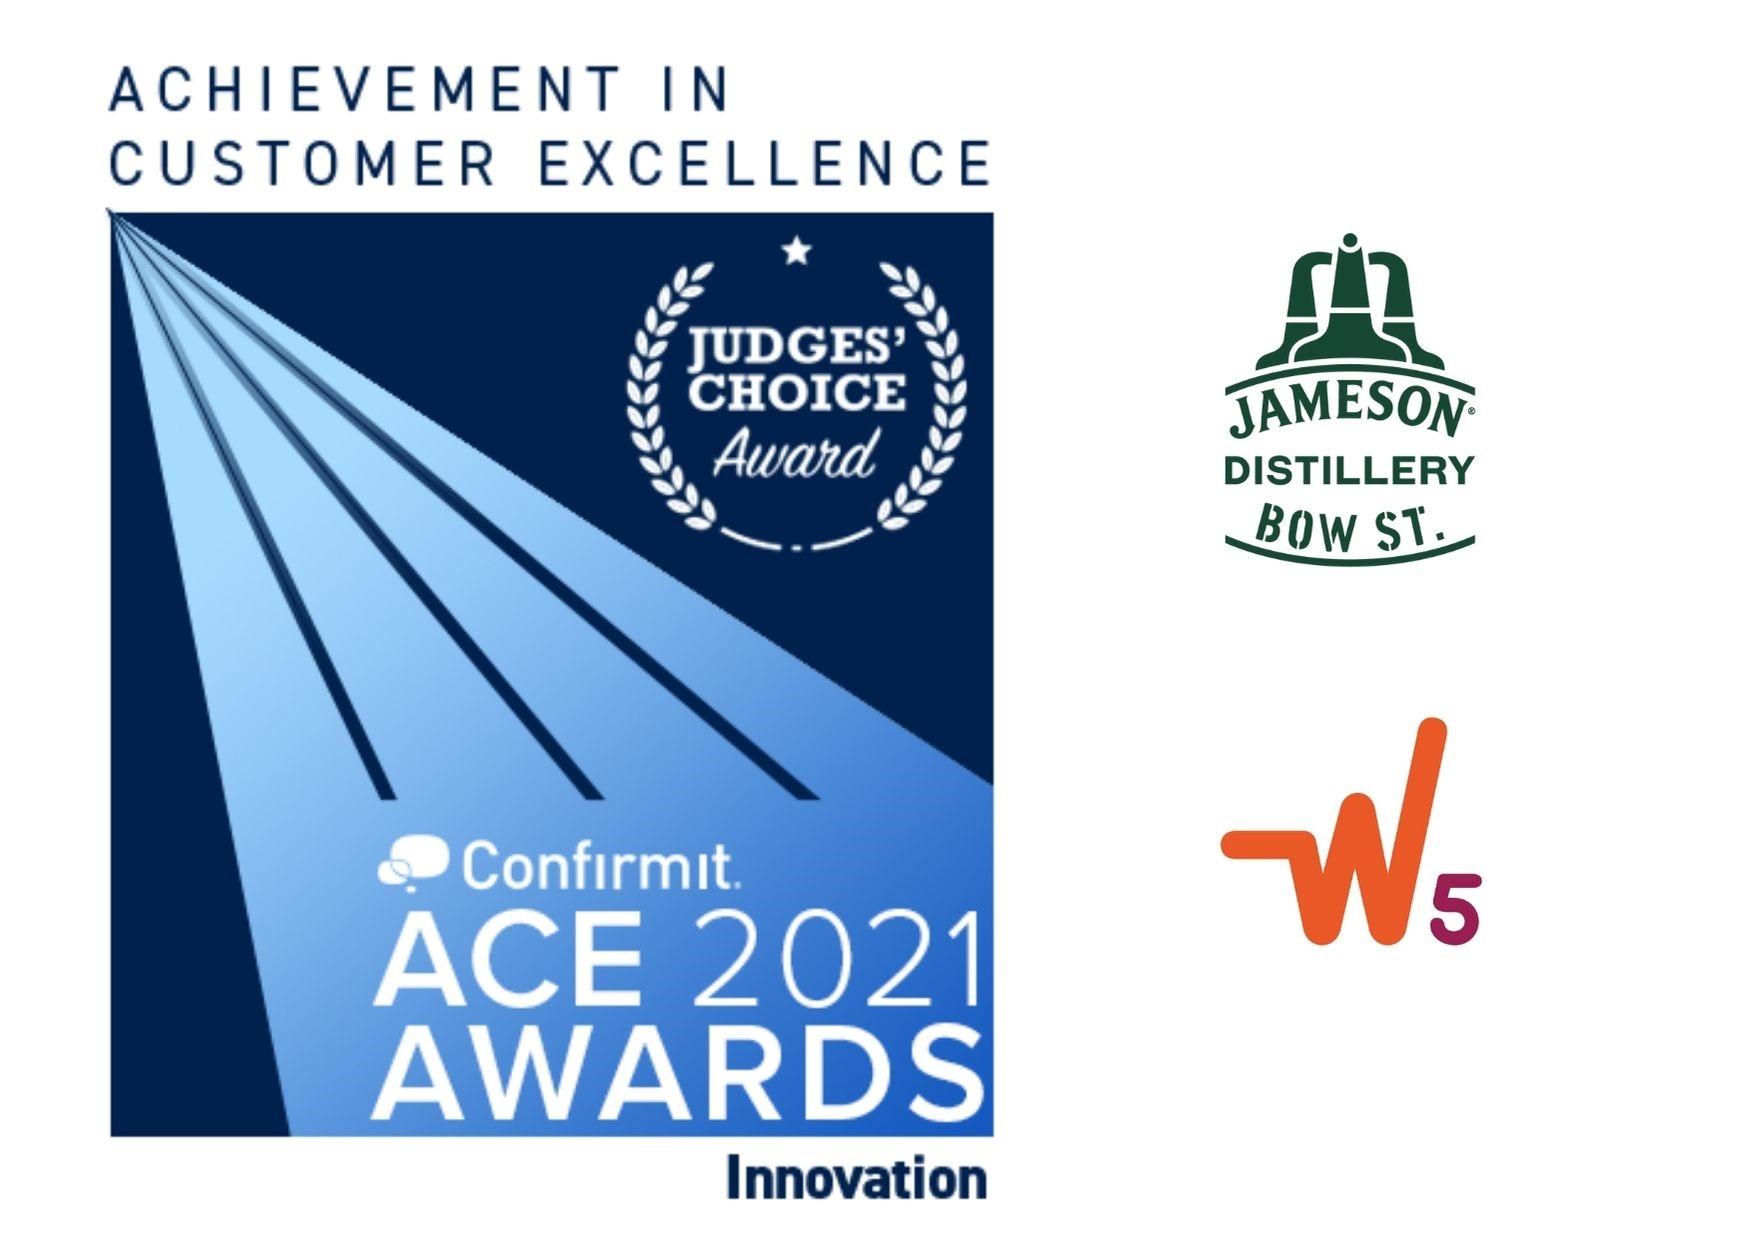 ACE-Award-W5-Jameson-Innovation-2021